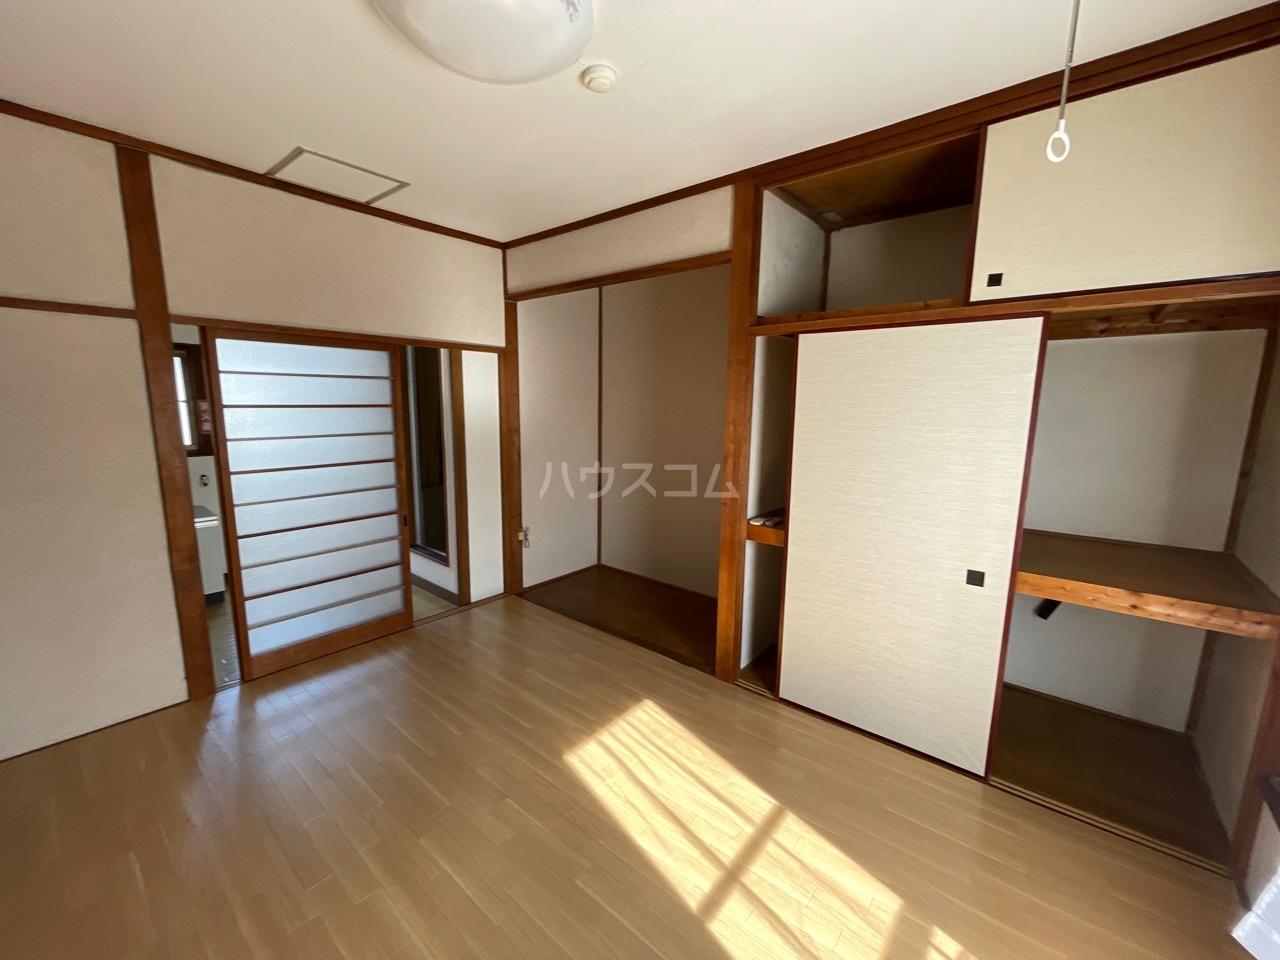 小澤荘 202号室の居室